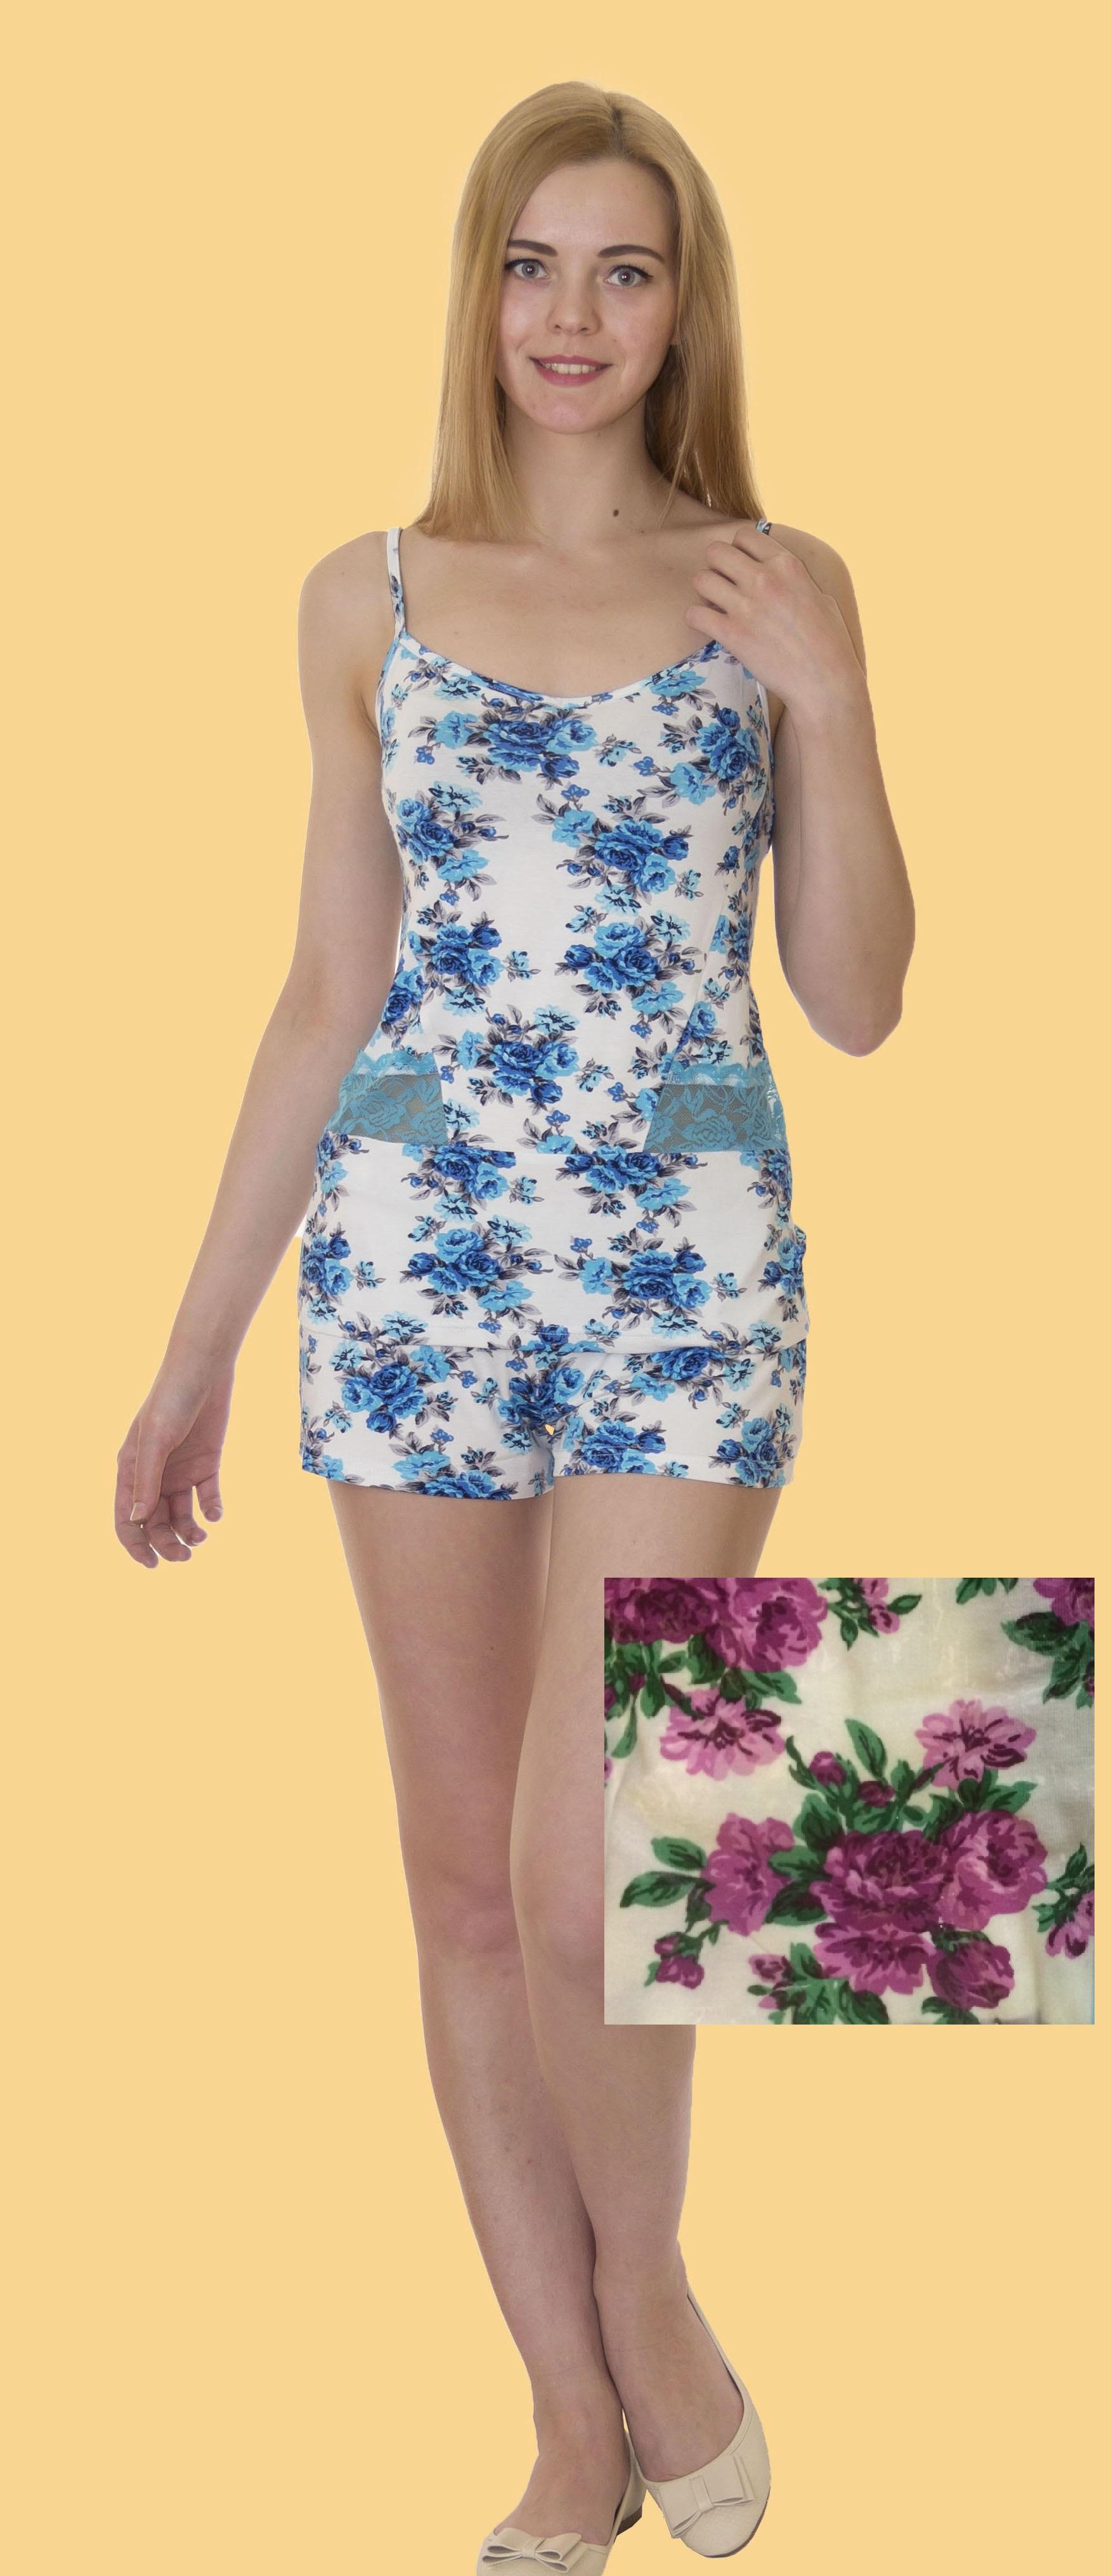 Пижамы Лотос Пижама Ассоль Цвет: Розовые Цветы (S) пижамы артишок пижама цветы